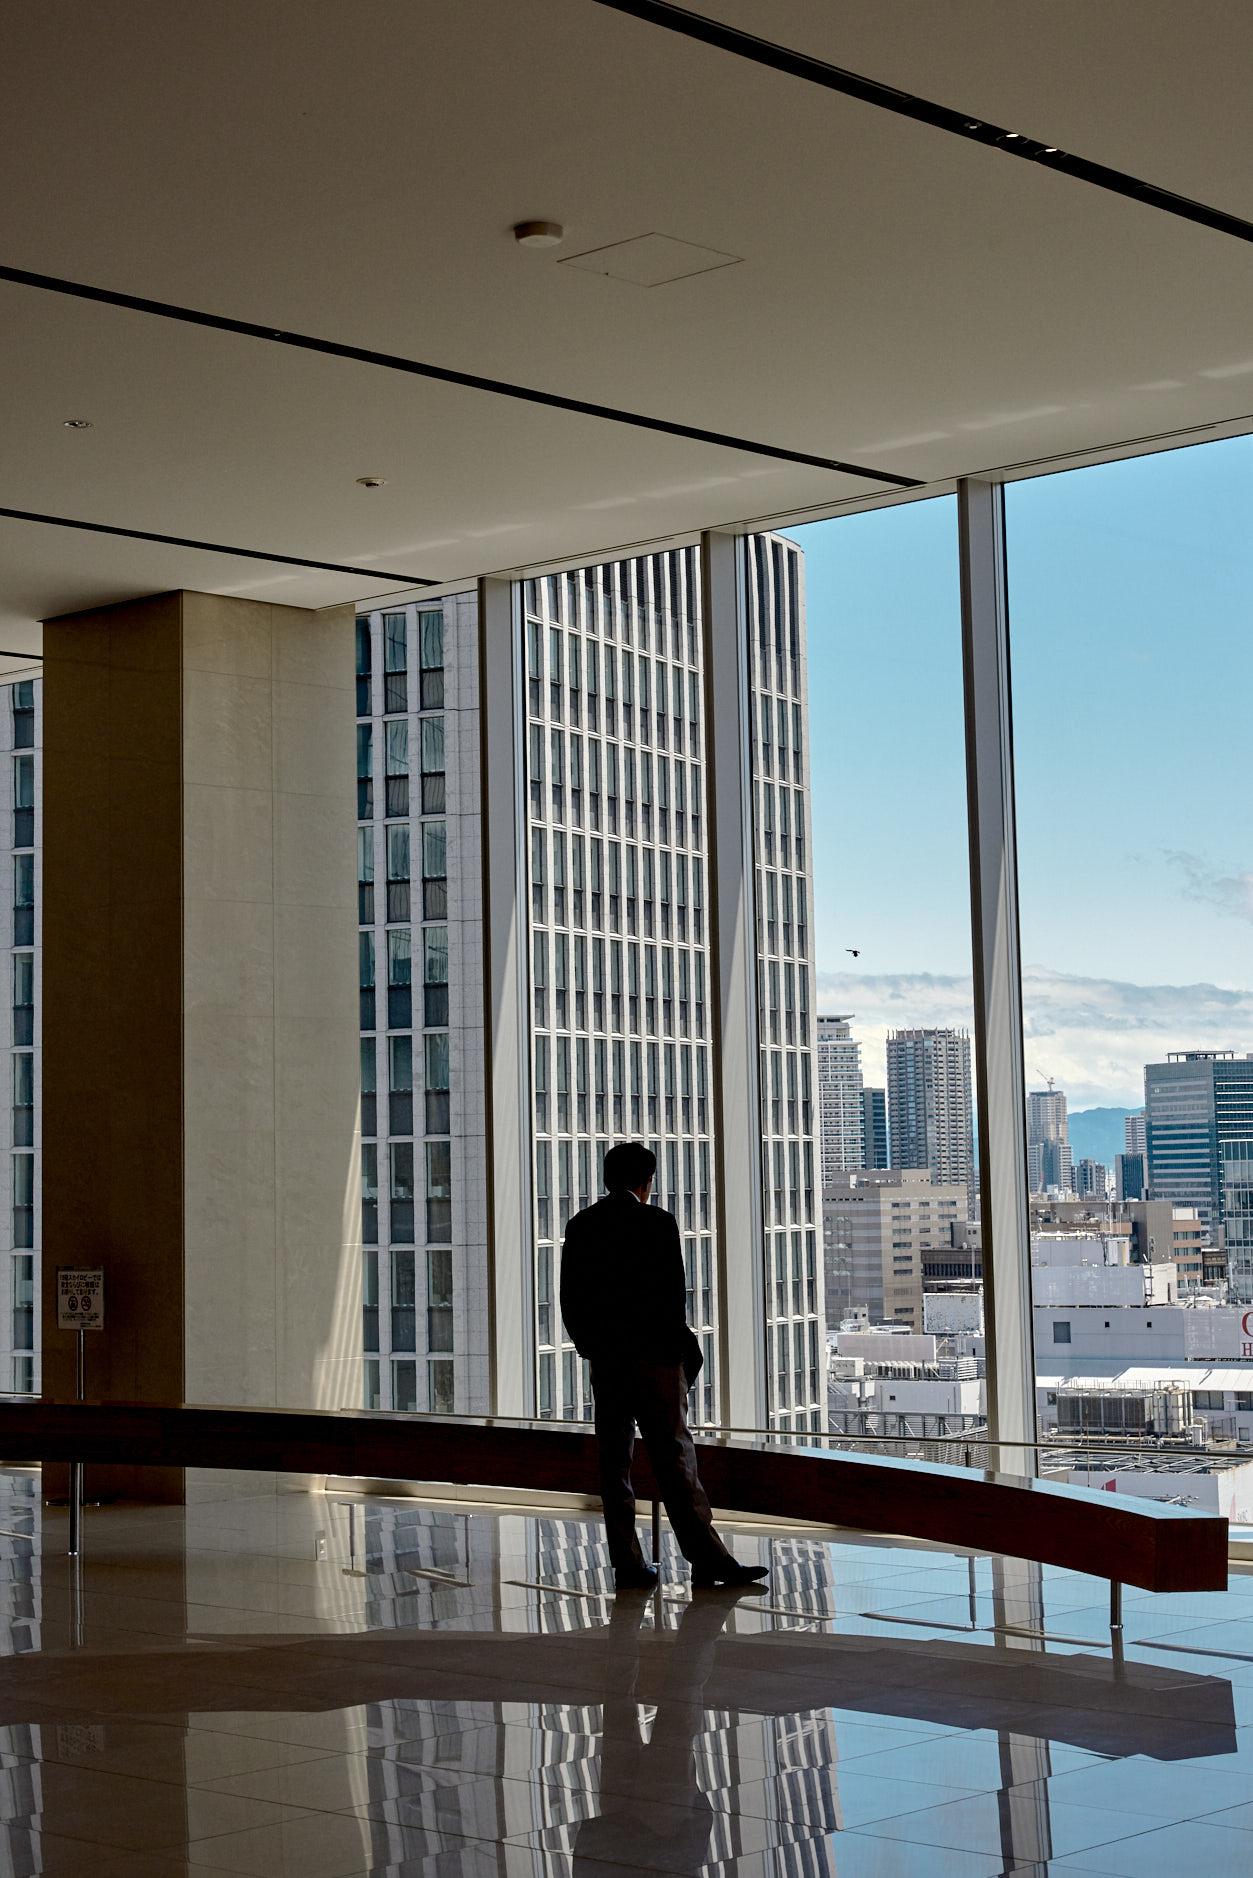 Yasara Gunawardena – Japan – Osaka – Silhouette